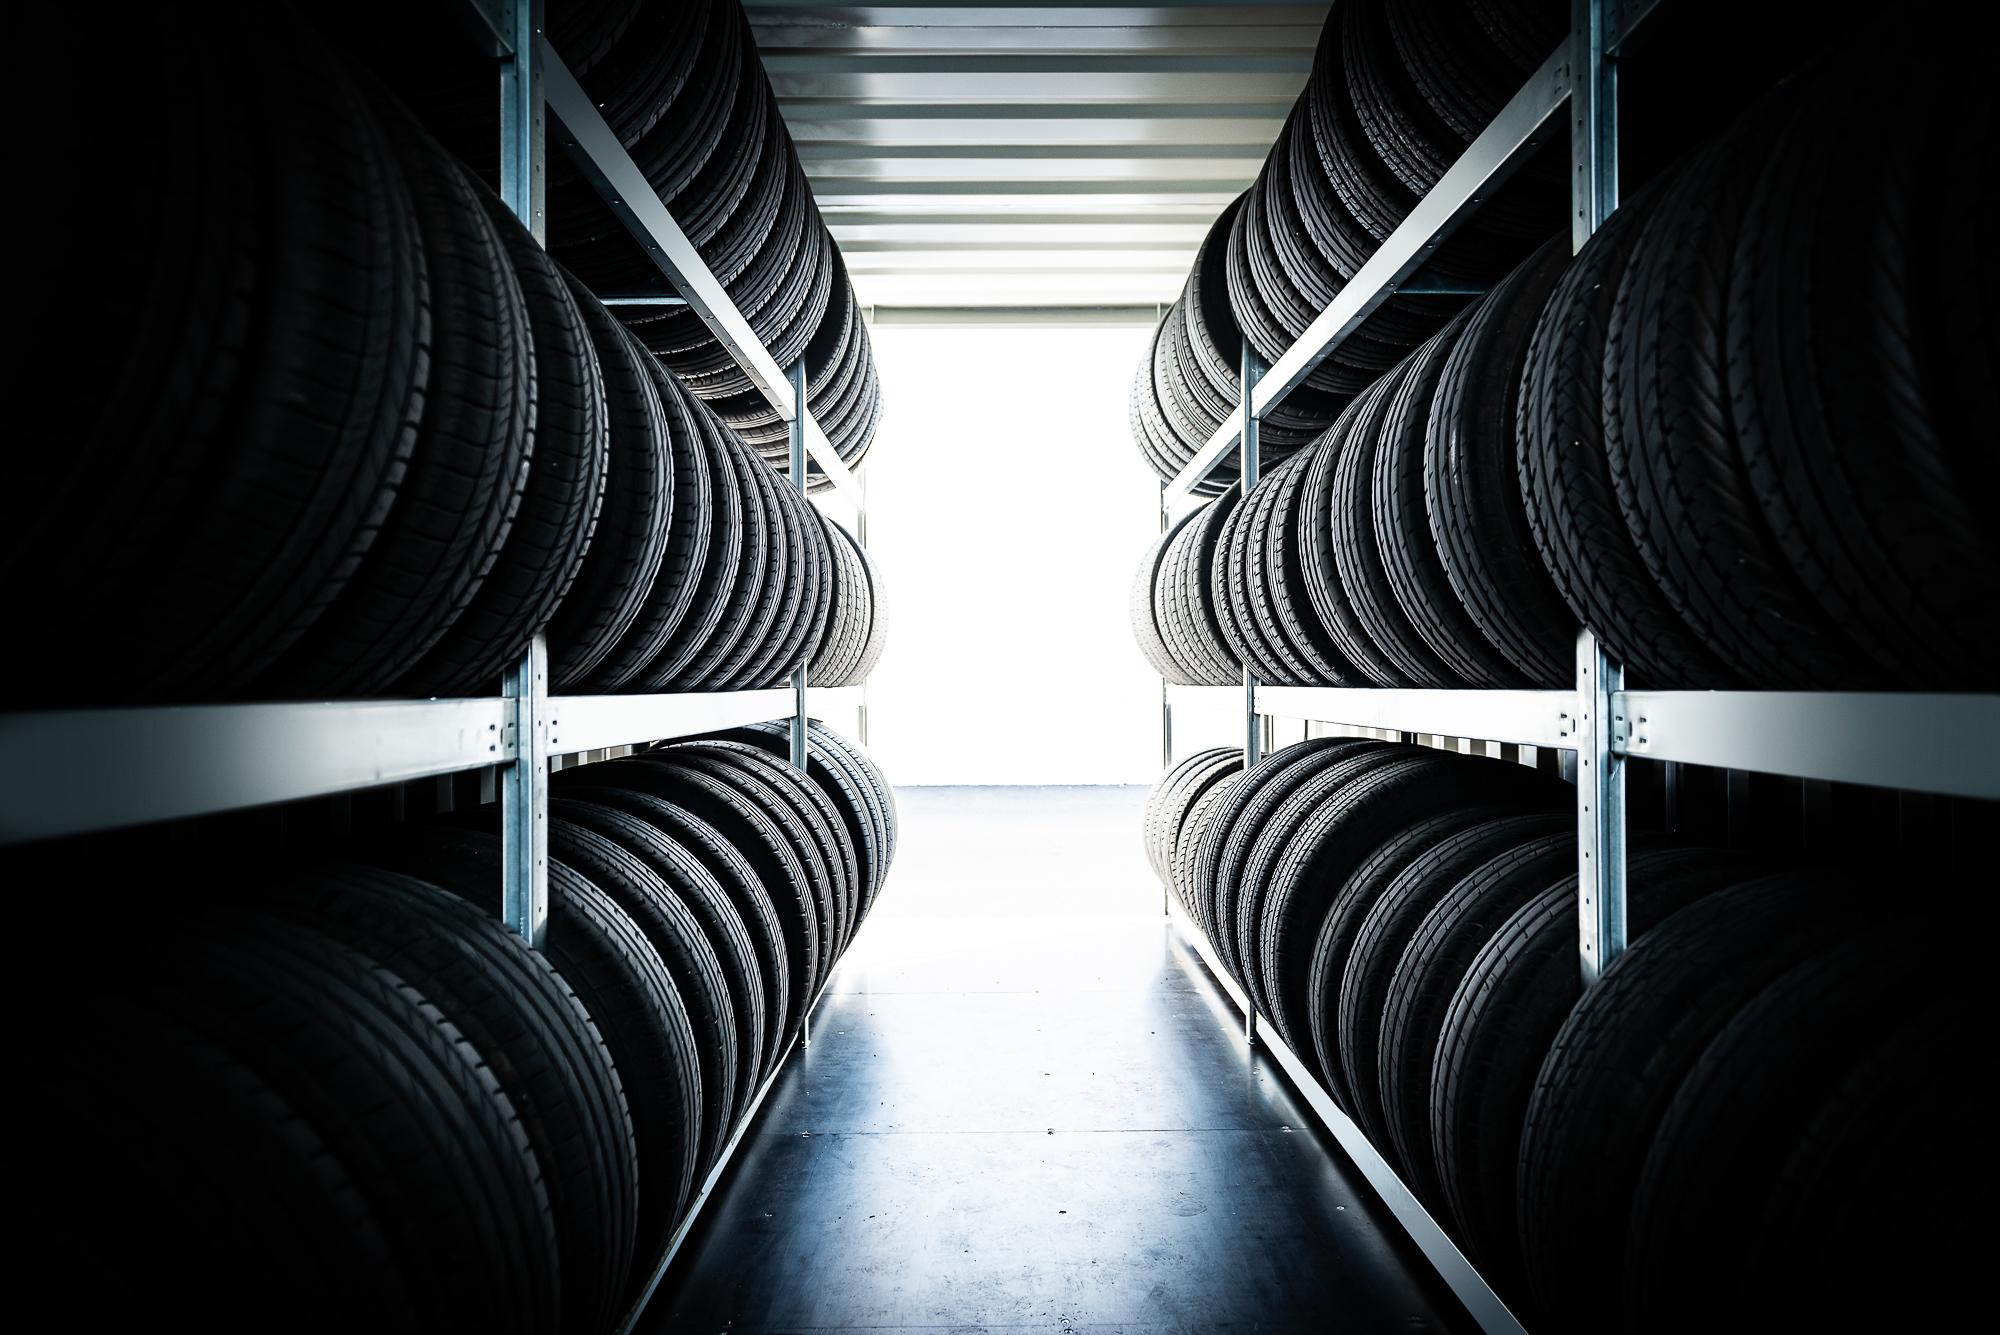 Rihringer Automotive Reifen-Shooting aus Commercial-Portfolio